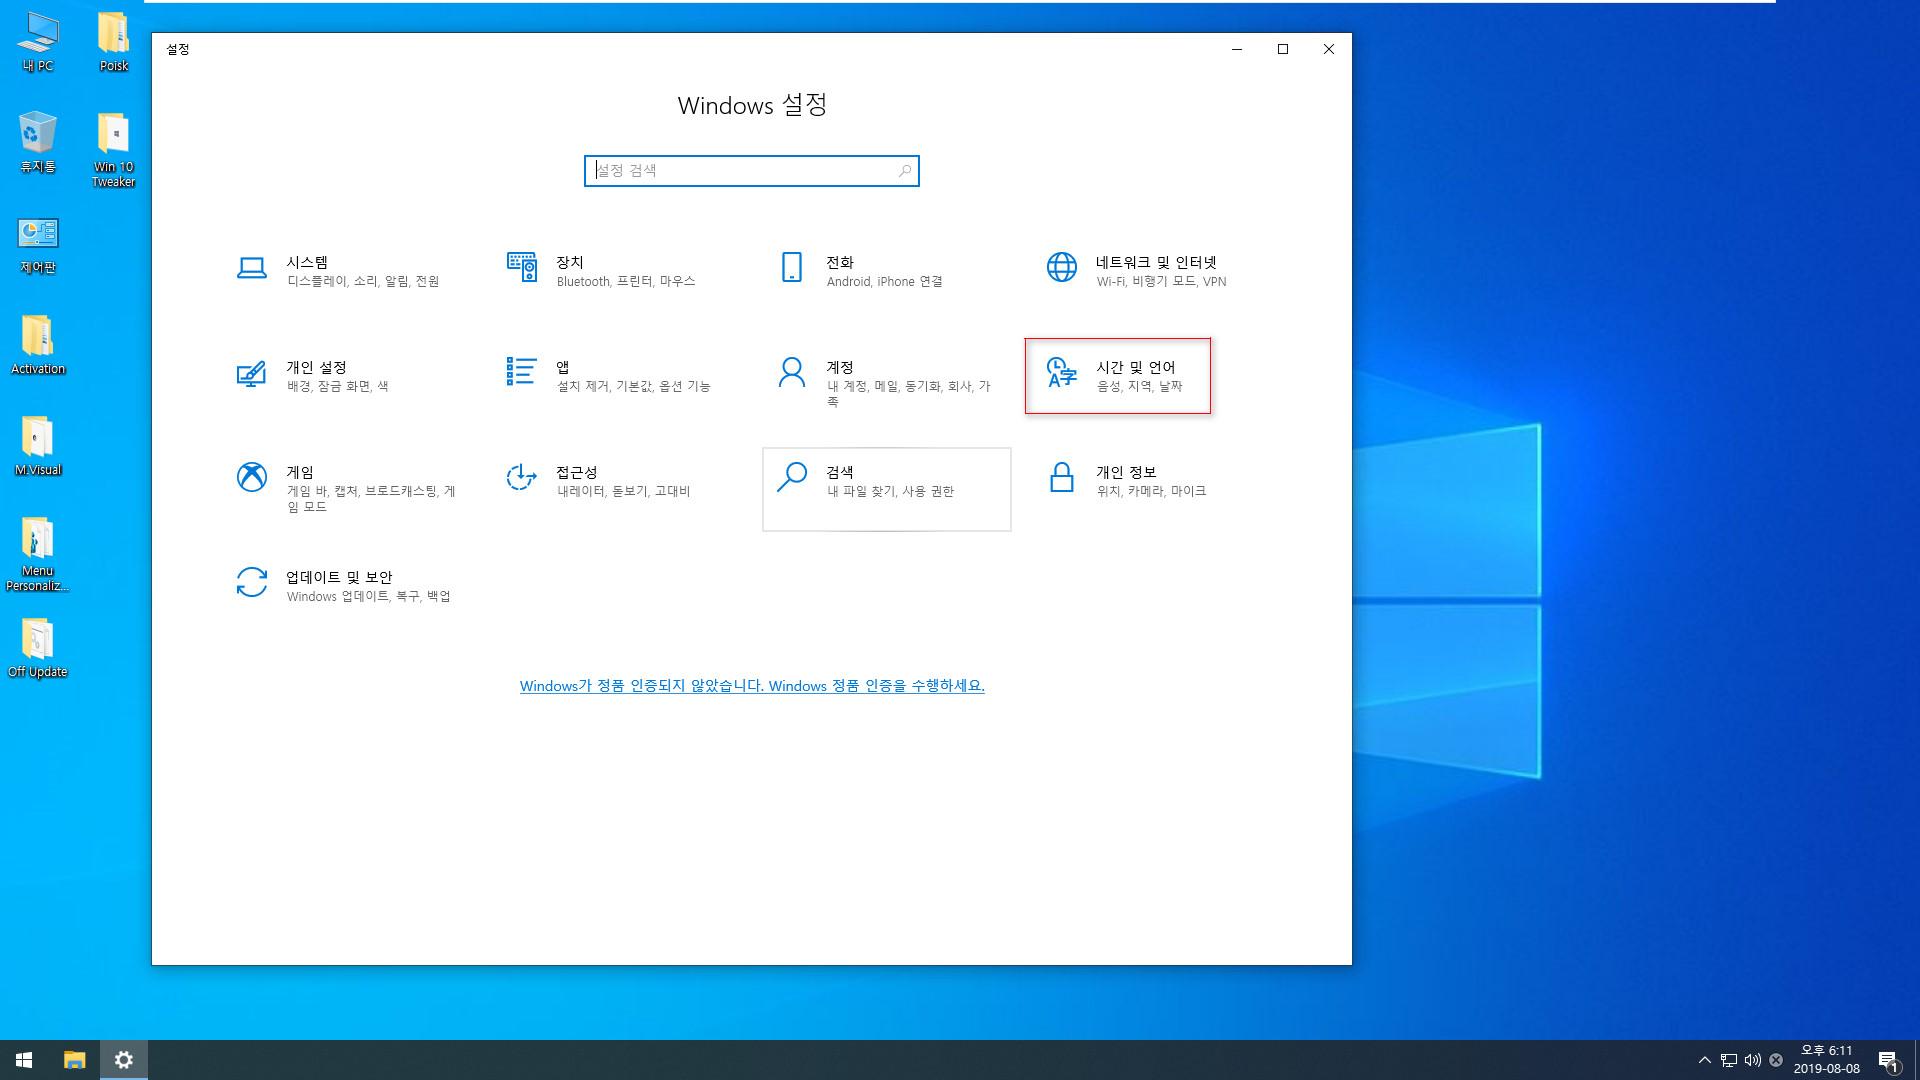 Windows 10 Enterprise x64 lite 1903 build 18362.267 by Zosma.iso - 러시아어 한글화 시도 - 그래서 그냥 원본대로 설치 후에 한글화 시도 2019-08-09_001159.jpg